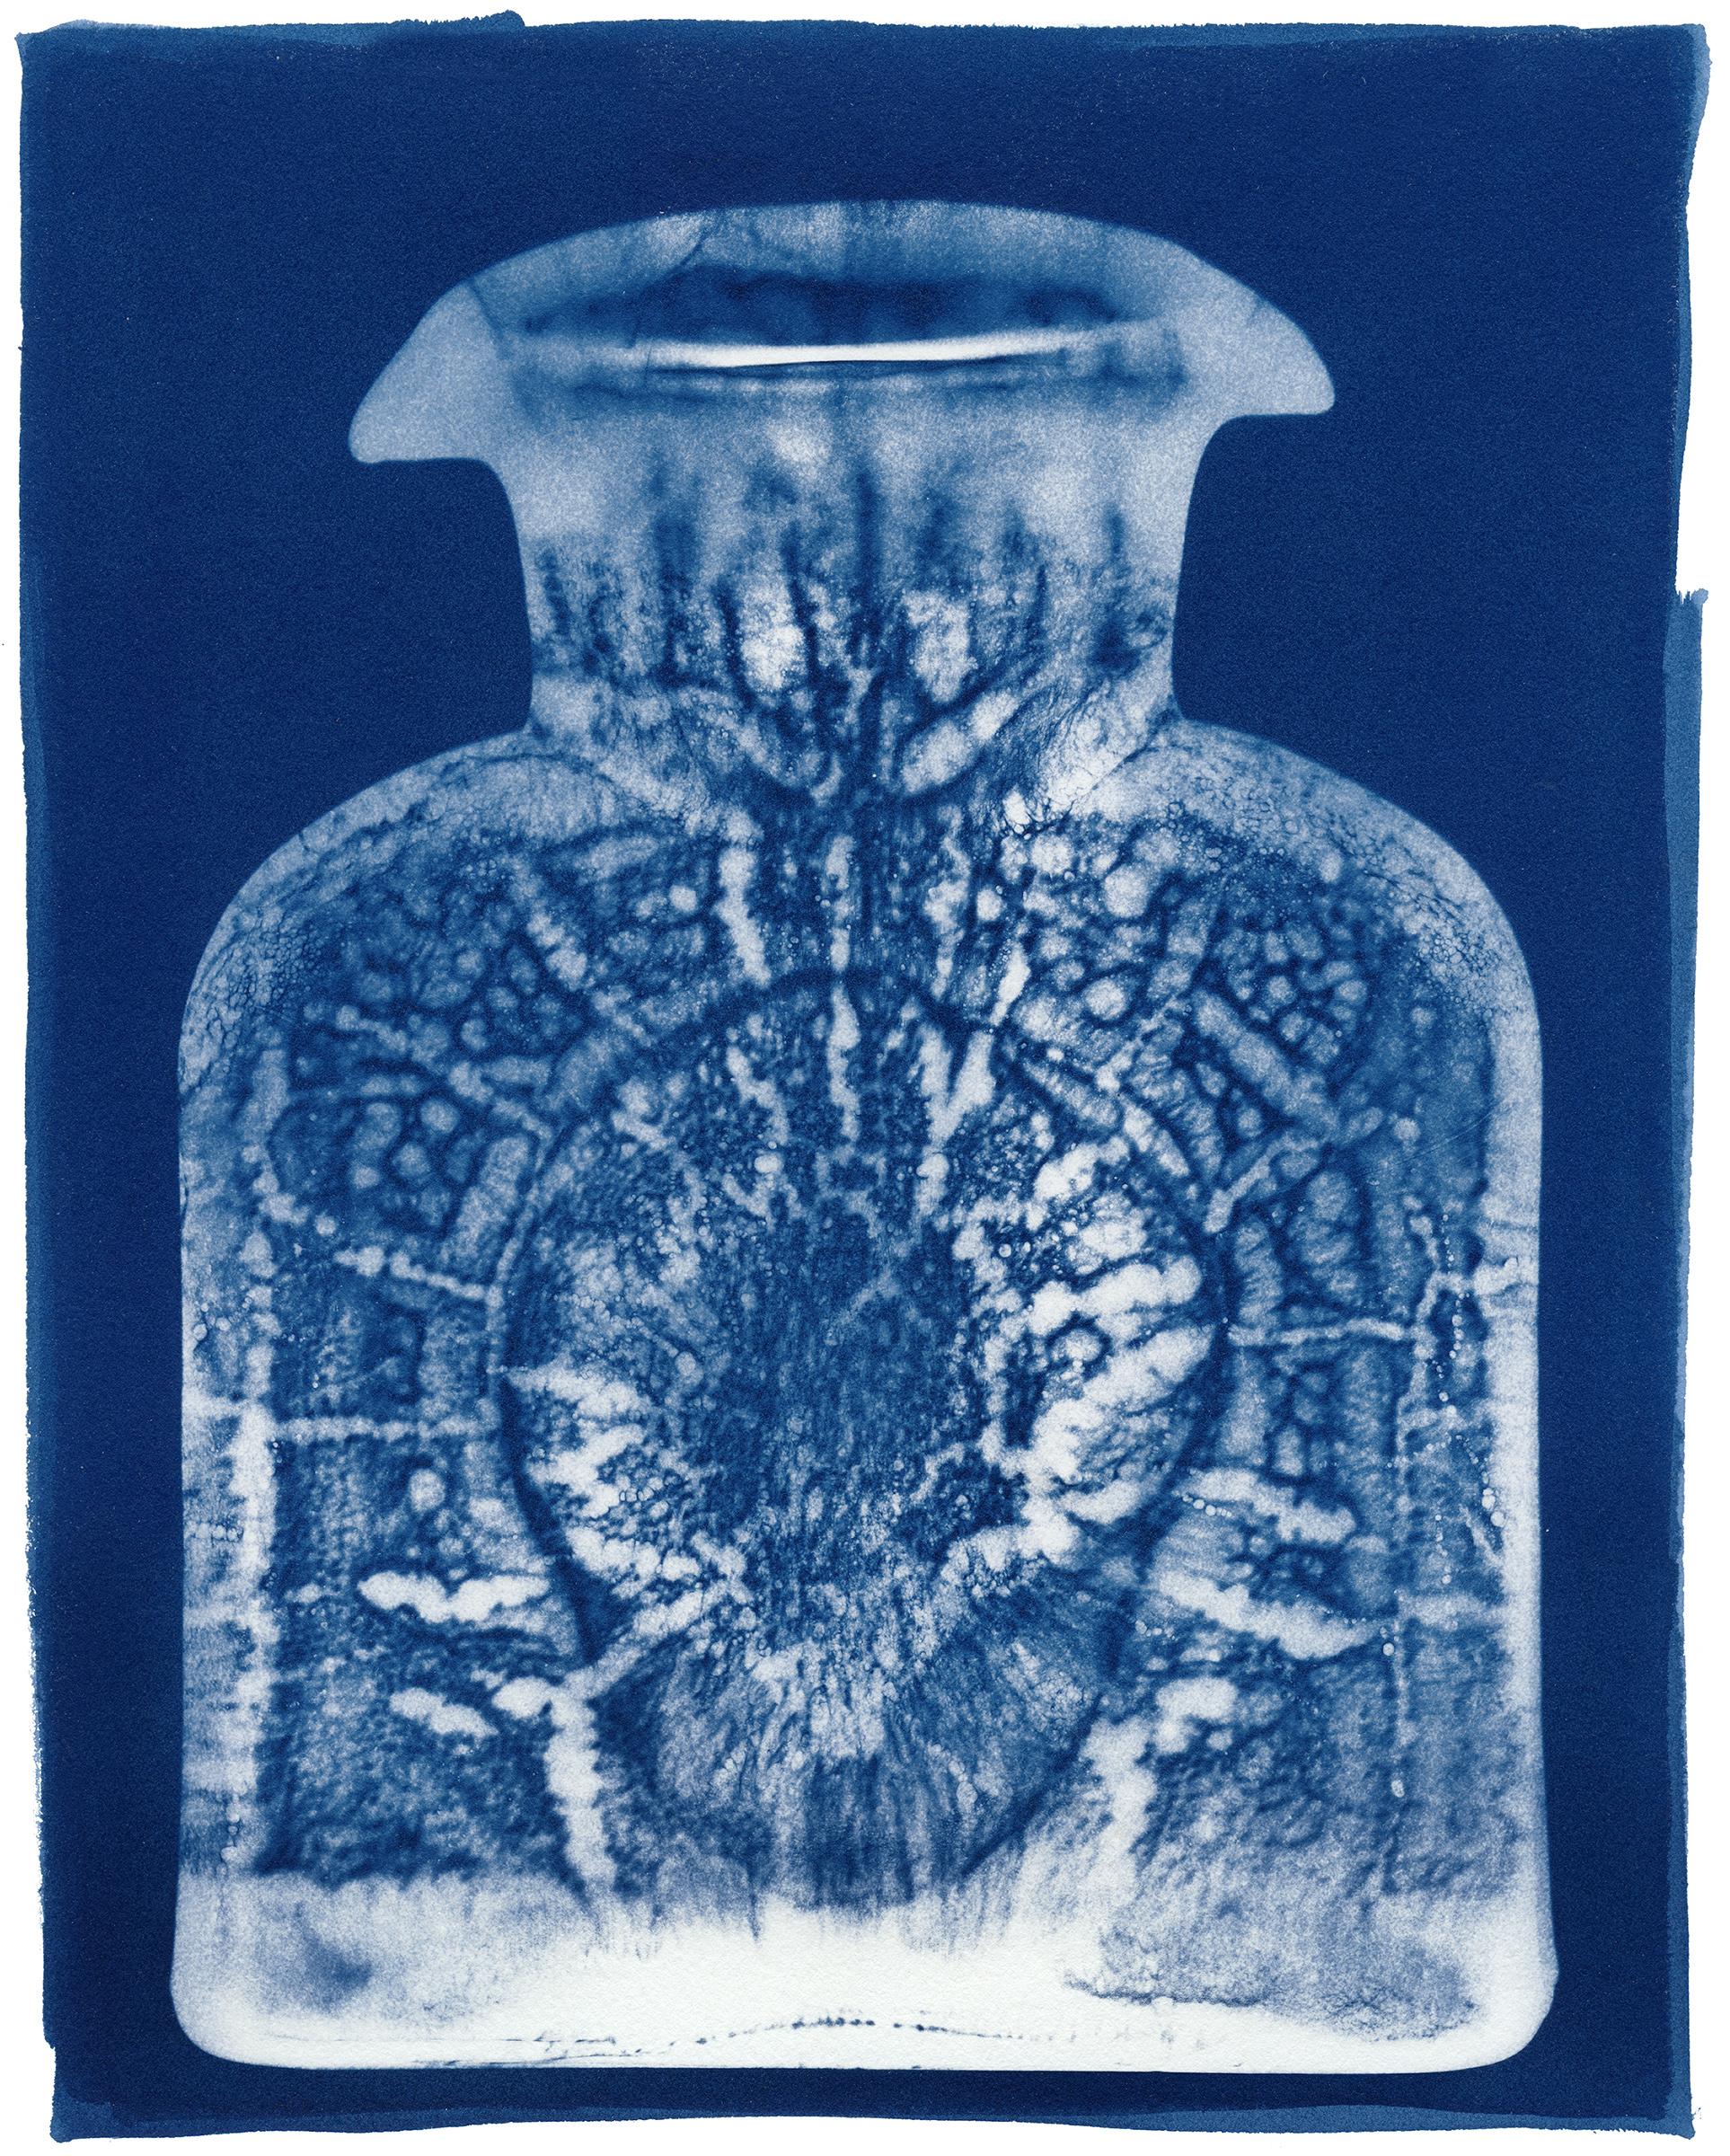 Blue Vase, 2011